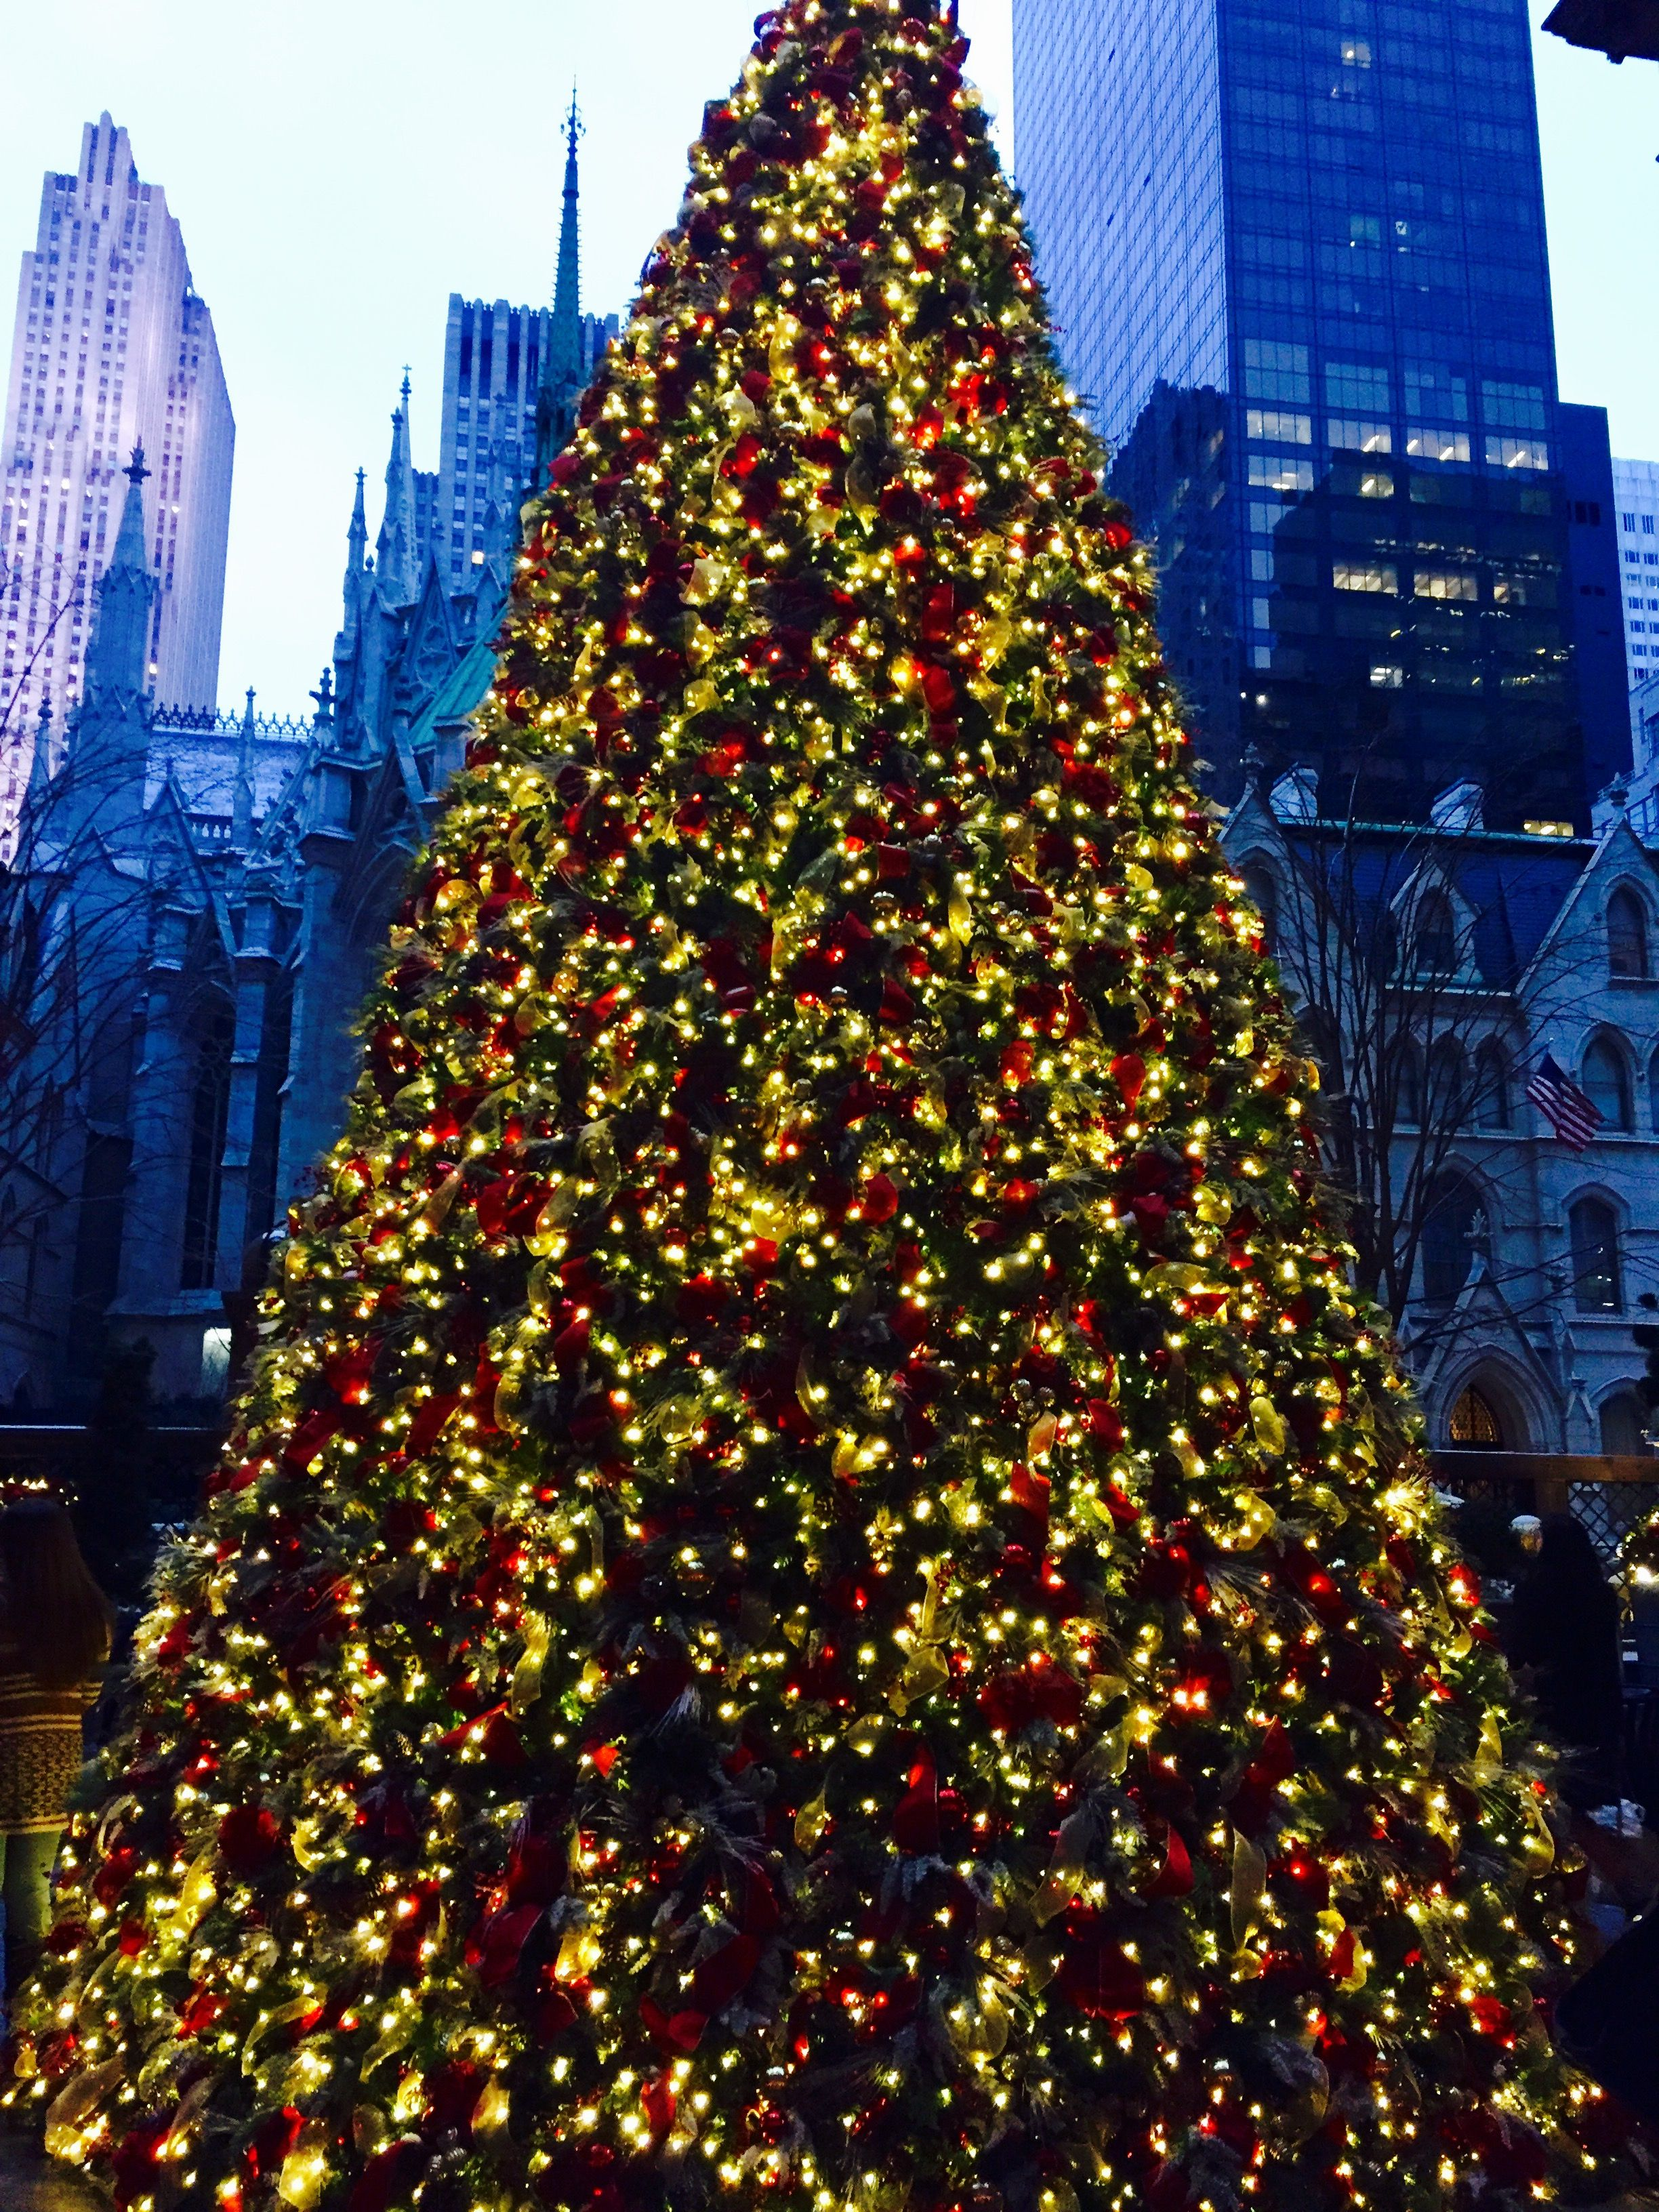 #ChristmasTree #Lotte#Palace #NewYork #Manhattan #Christmas #luxuryhotel #travel | North america ...